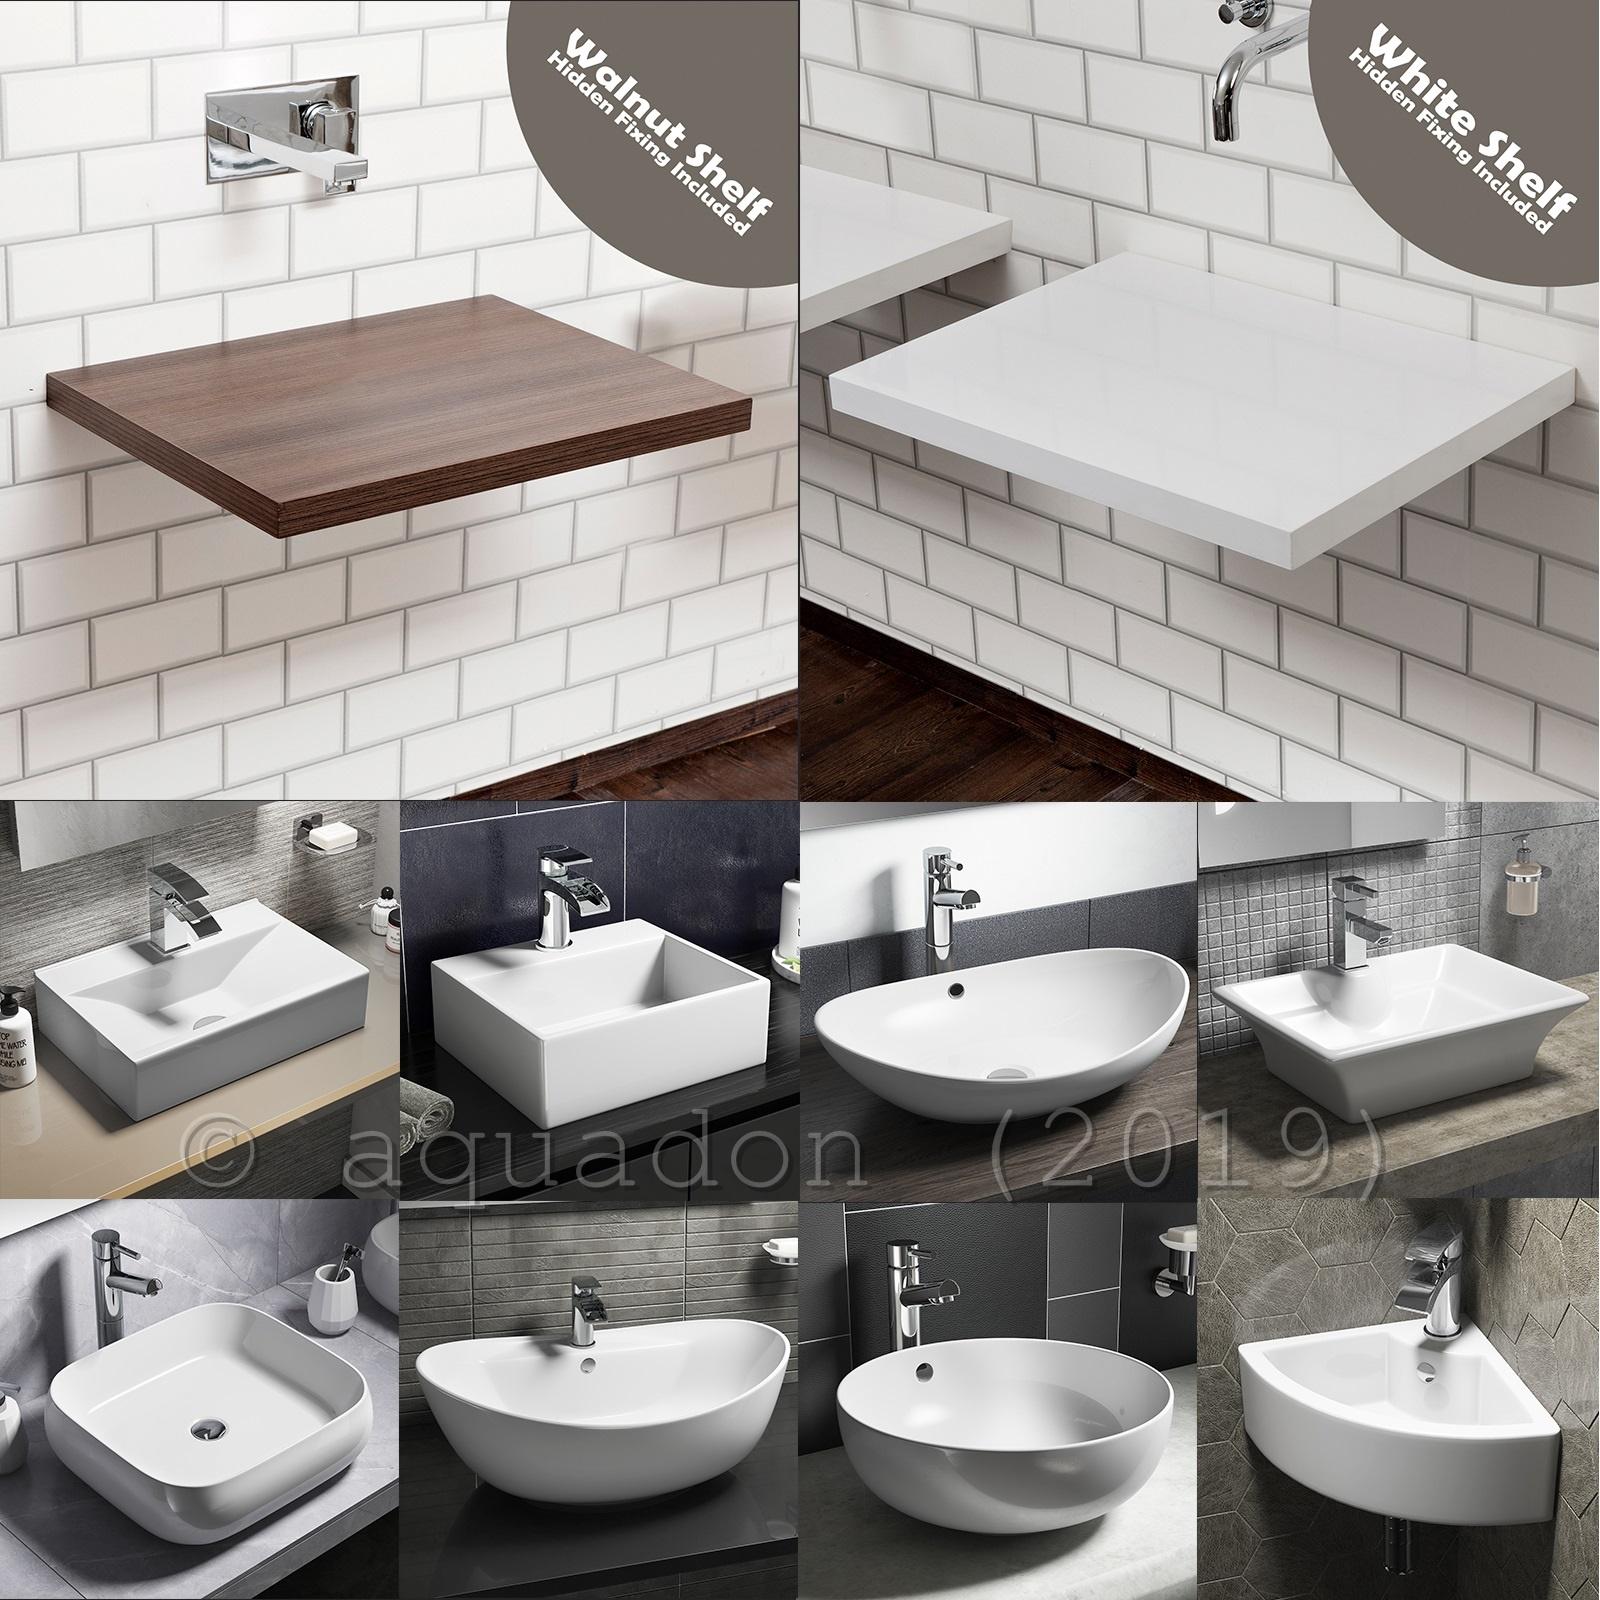 Picture of: Vessel Basin Sink Floating Shelves Shelf Bathrooms White Gloss Solid Stone Resin Ebay